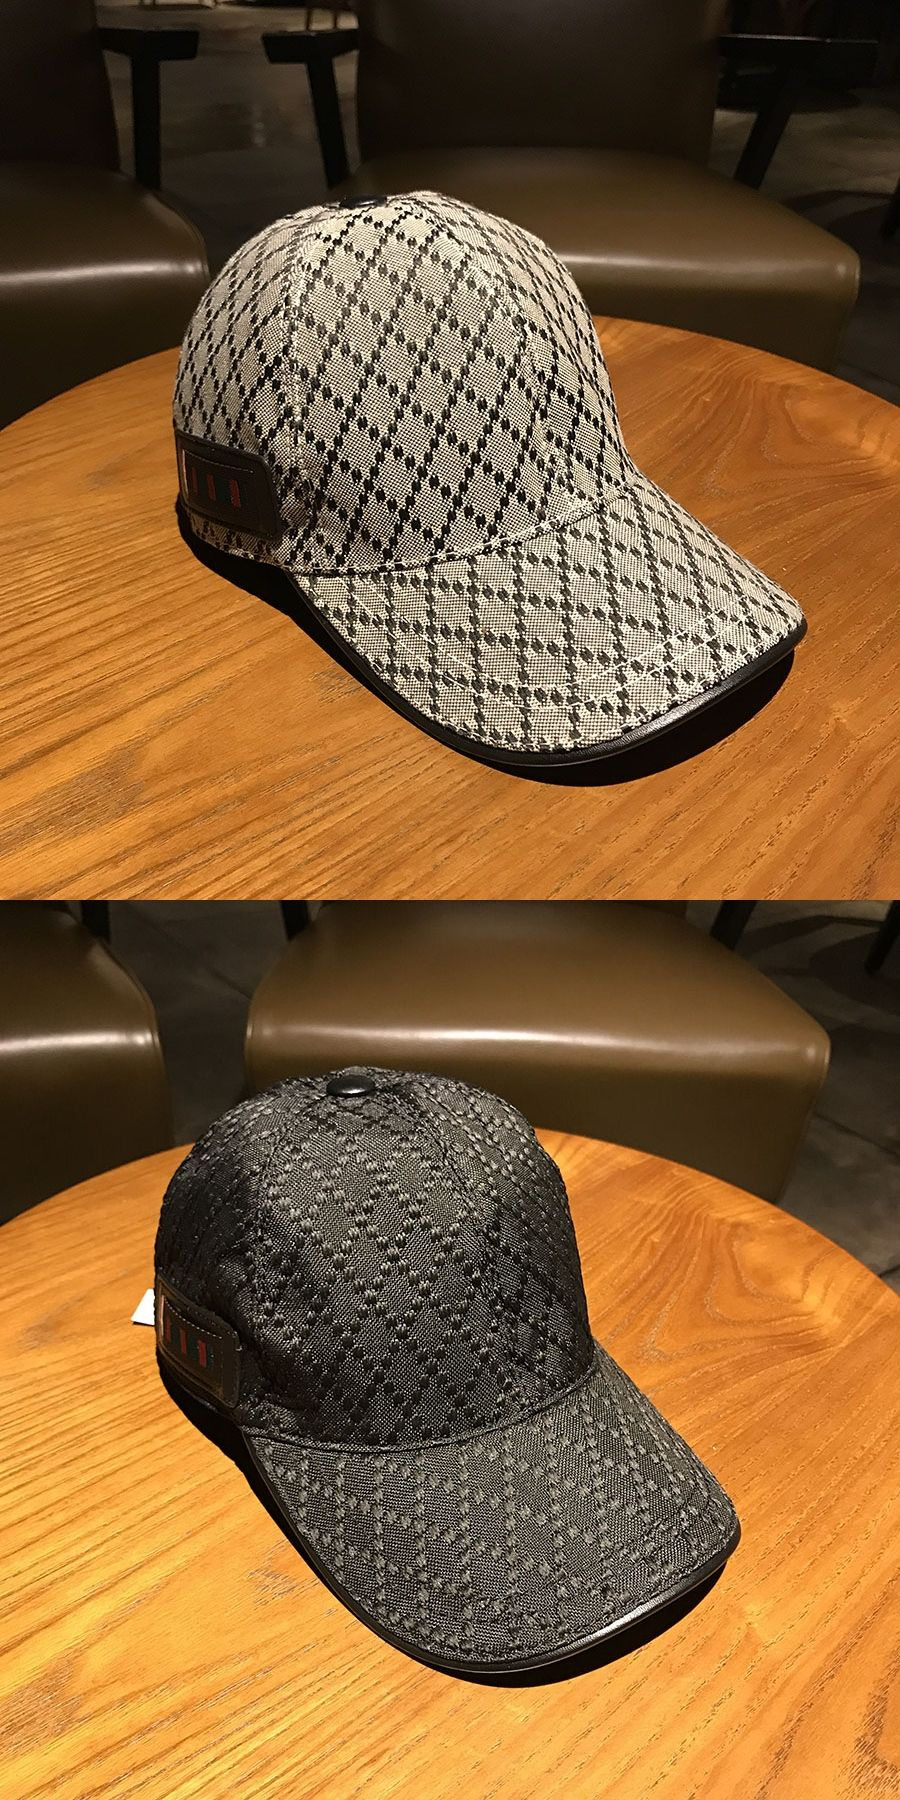 New Wholesale Baseball Cap Women Men Fashion Sport Plaid Desig Outdoor  Travel Sun Hat design Luxury brand Caps red ribbon hats bda618b85656